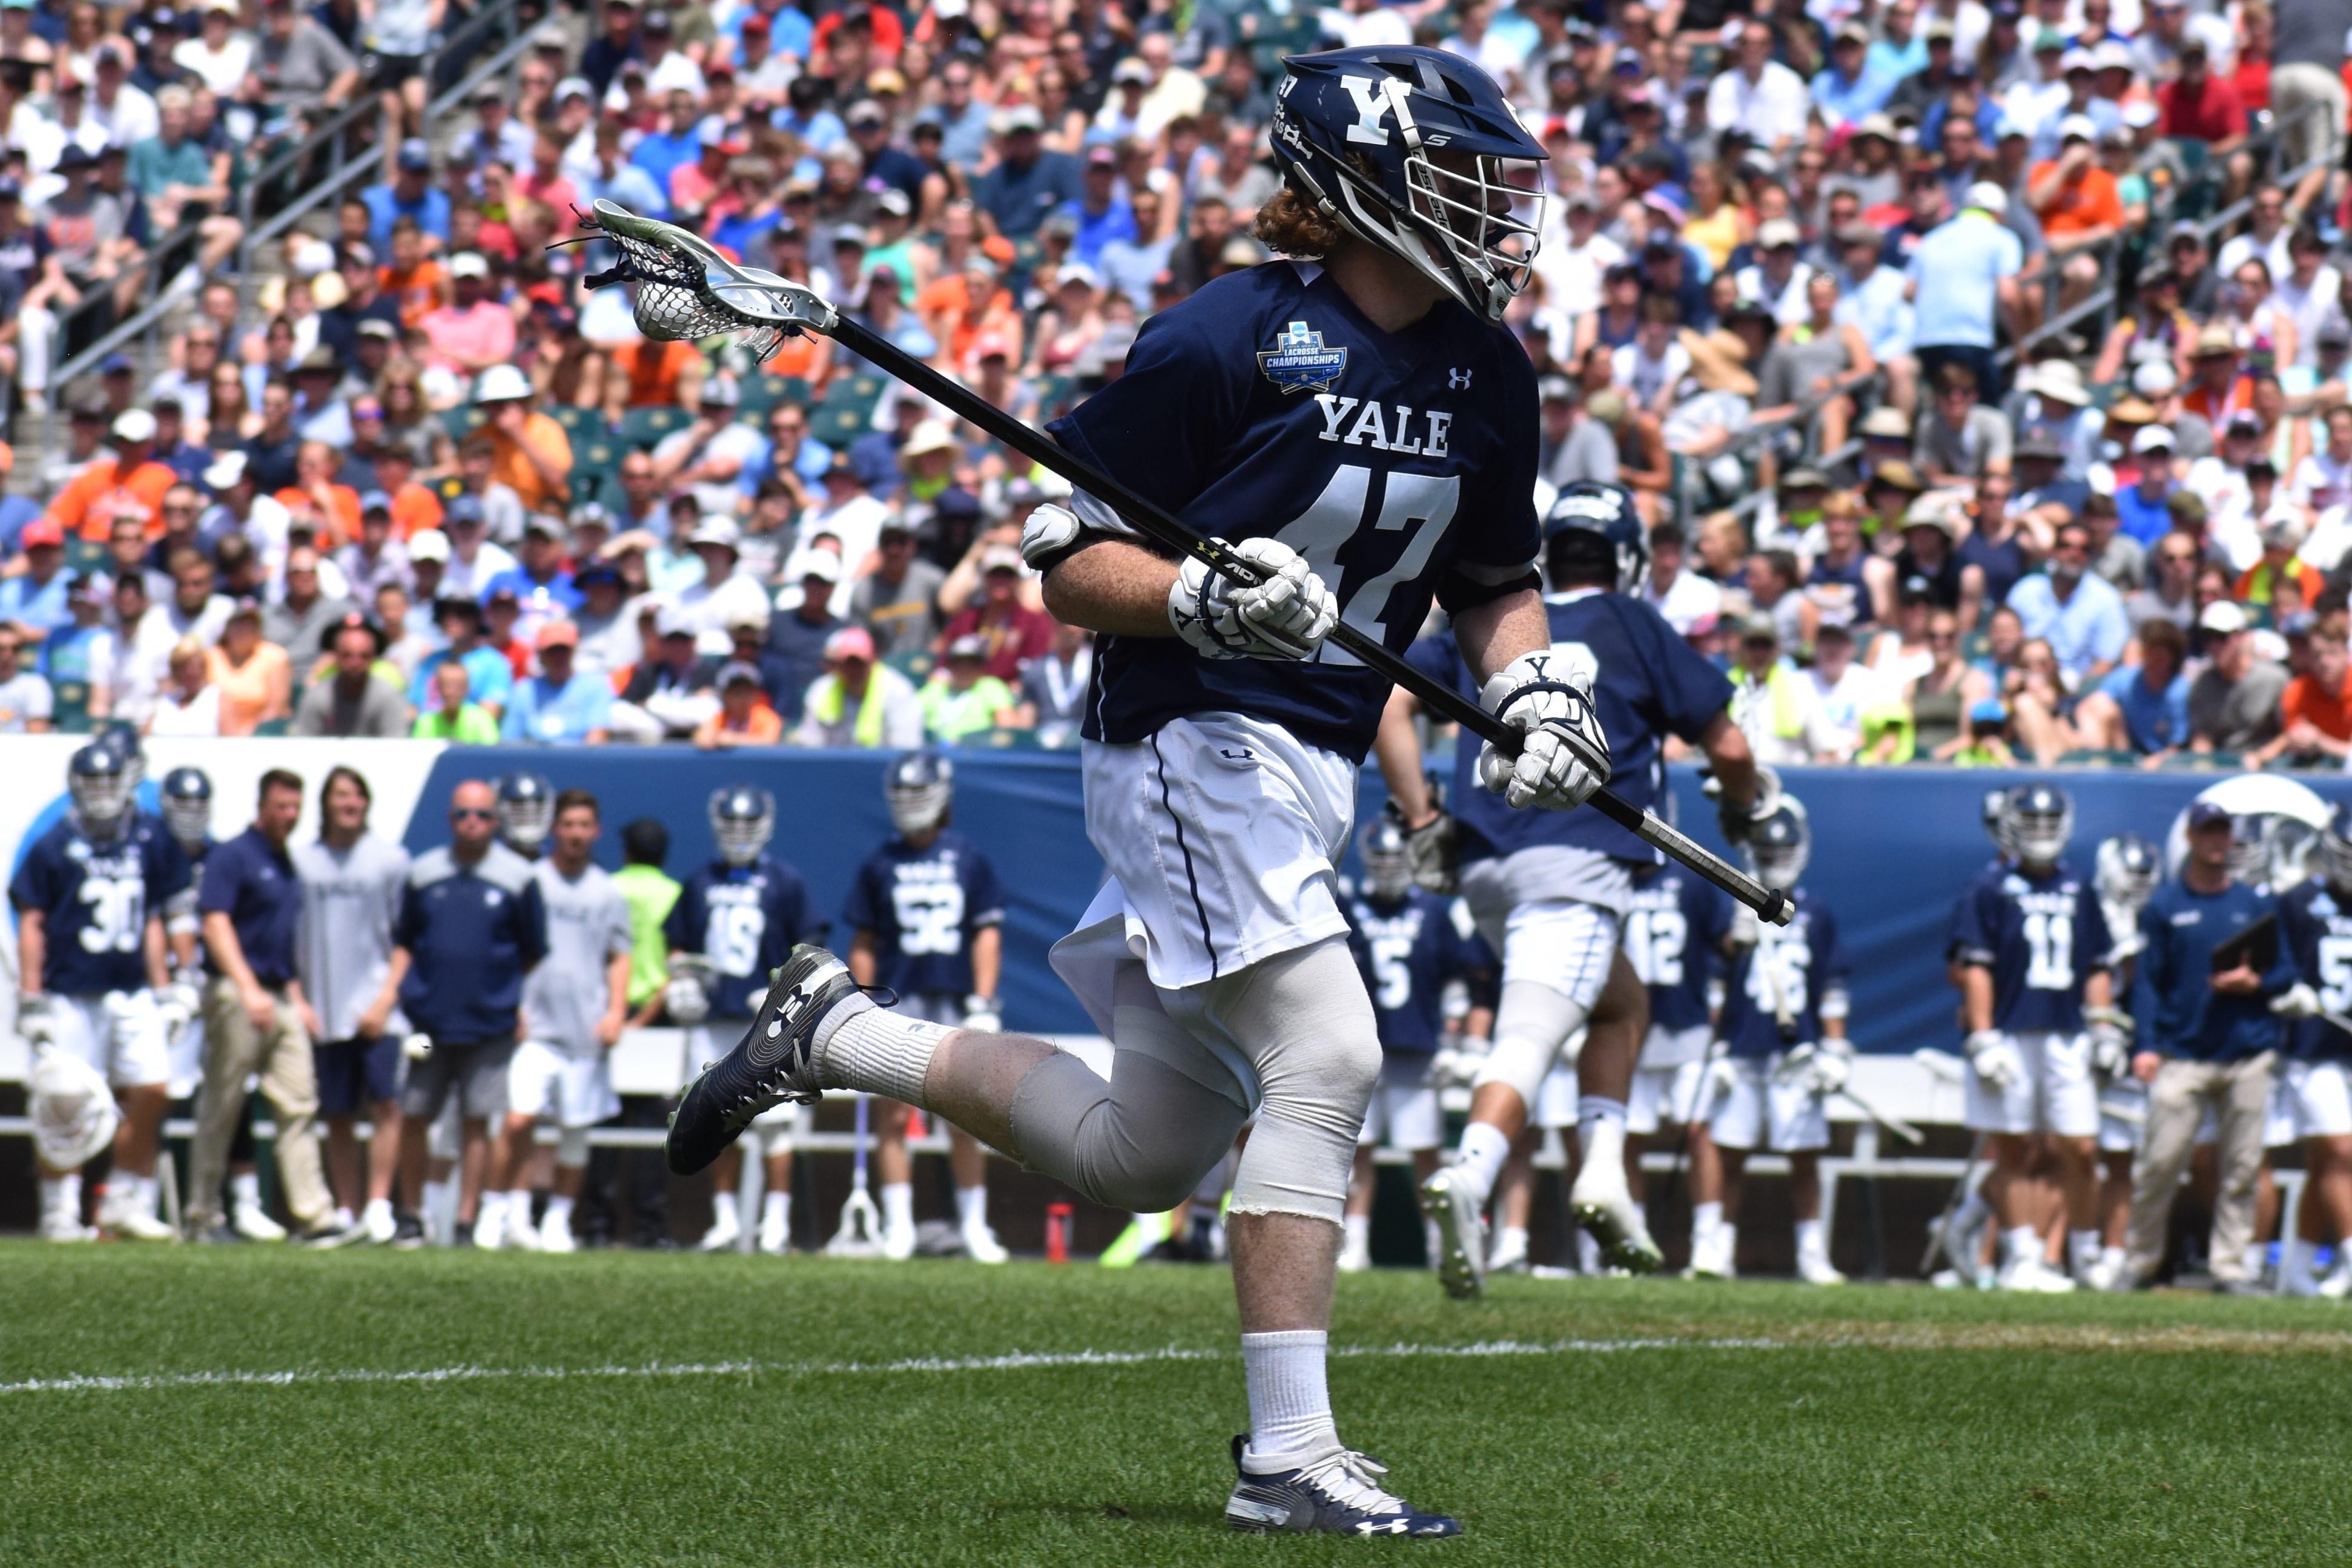 Hynes PLL Draft, MLL Draft: Making Sense of Two Leagues, One Class photo Ryan Conwell Yale 2019